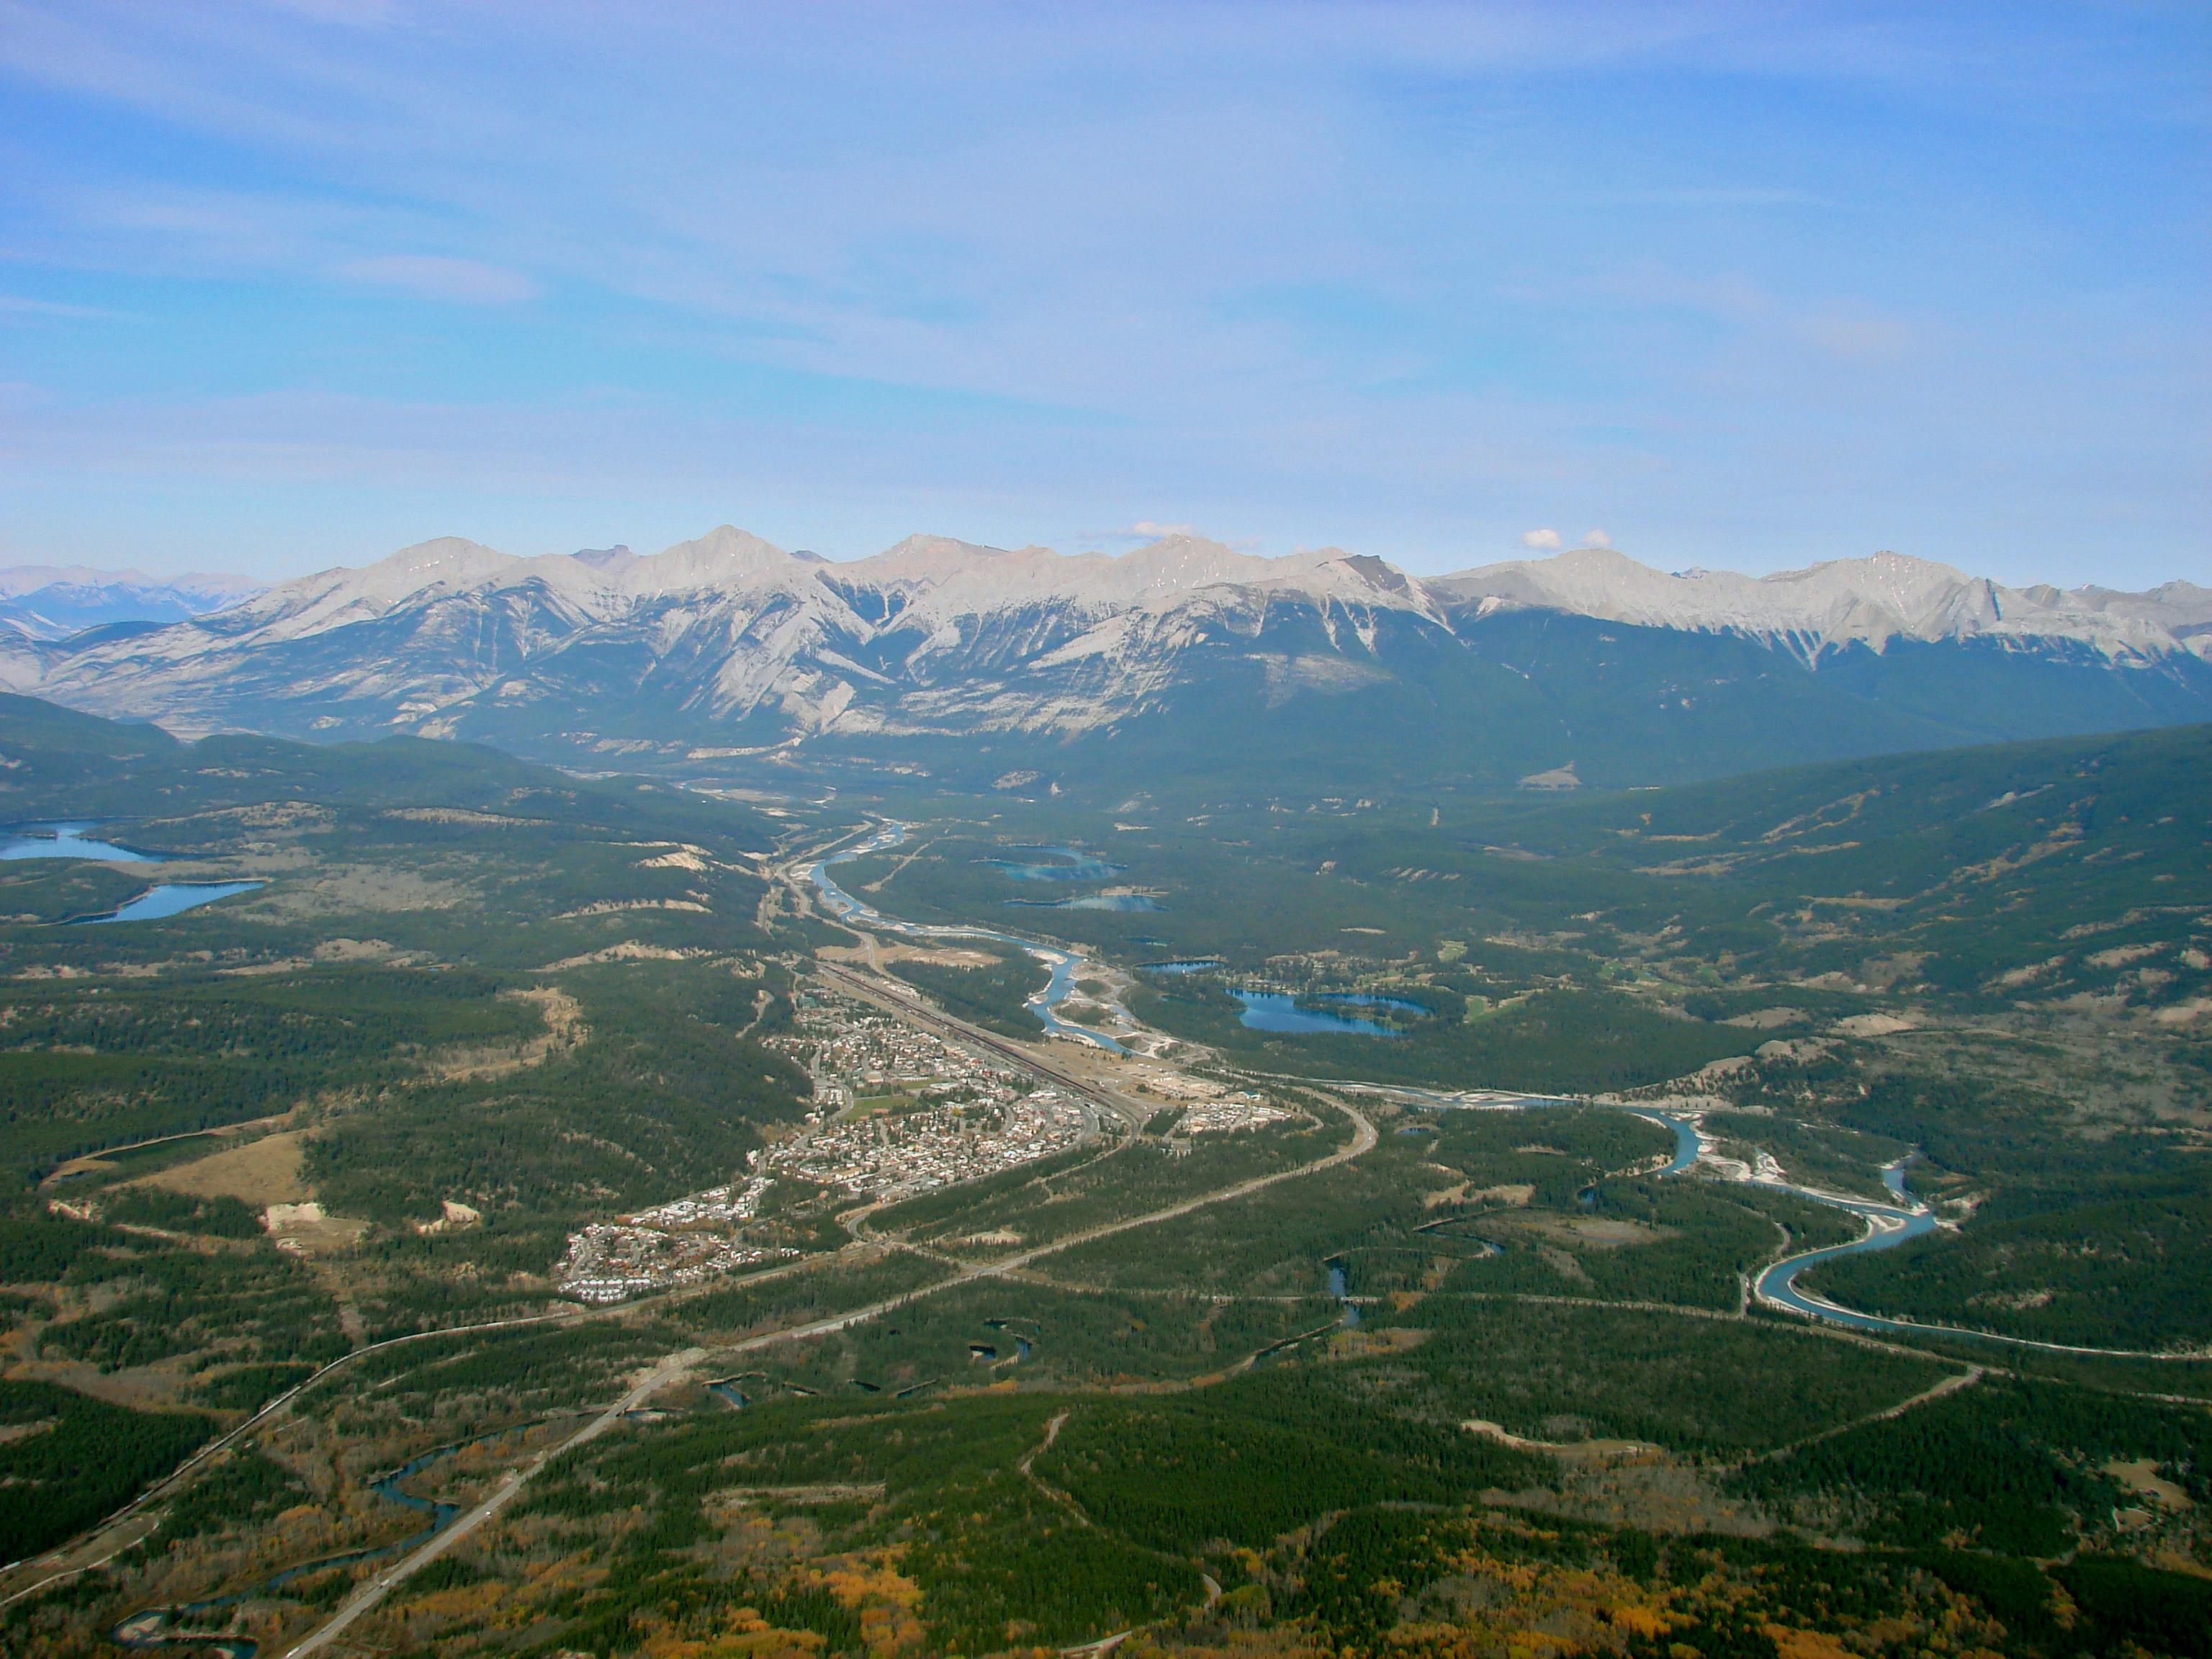 File:Jasper,_Alberta,_Canada,_ViewFromSummit_RyanShepherd on Pyramid House